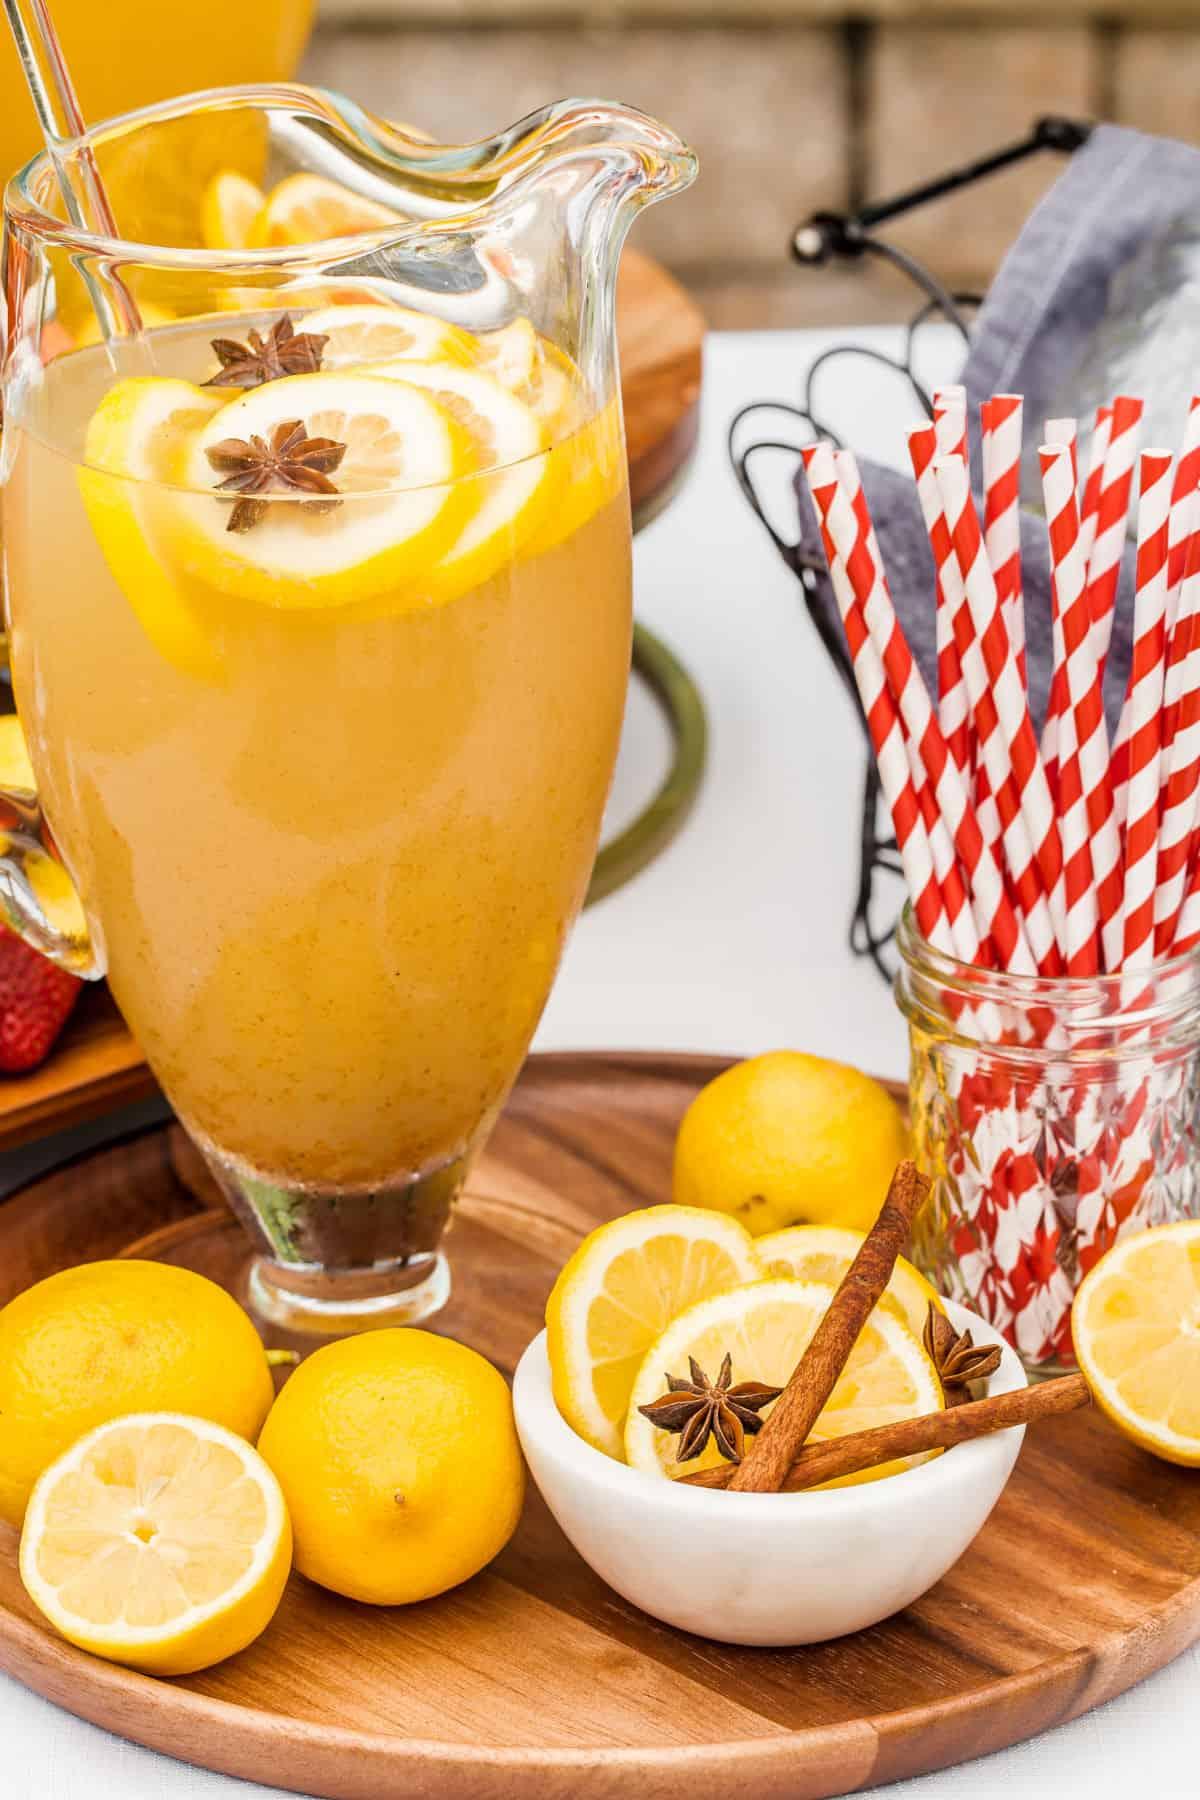 lemonade in pitcher with lemons and cinnamon sticks garnish